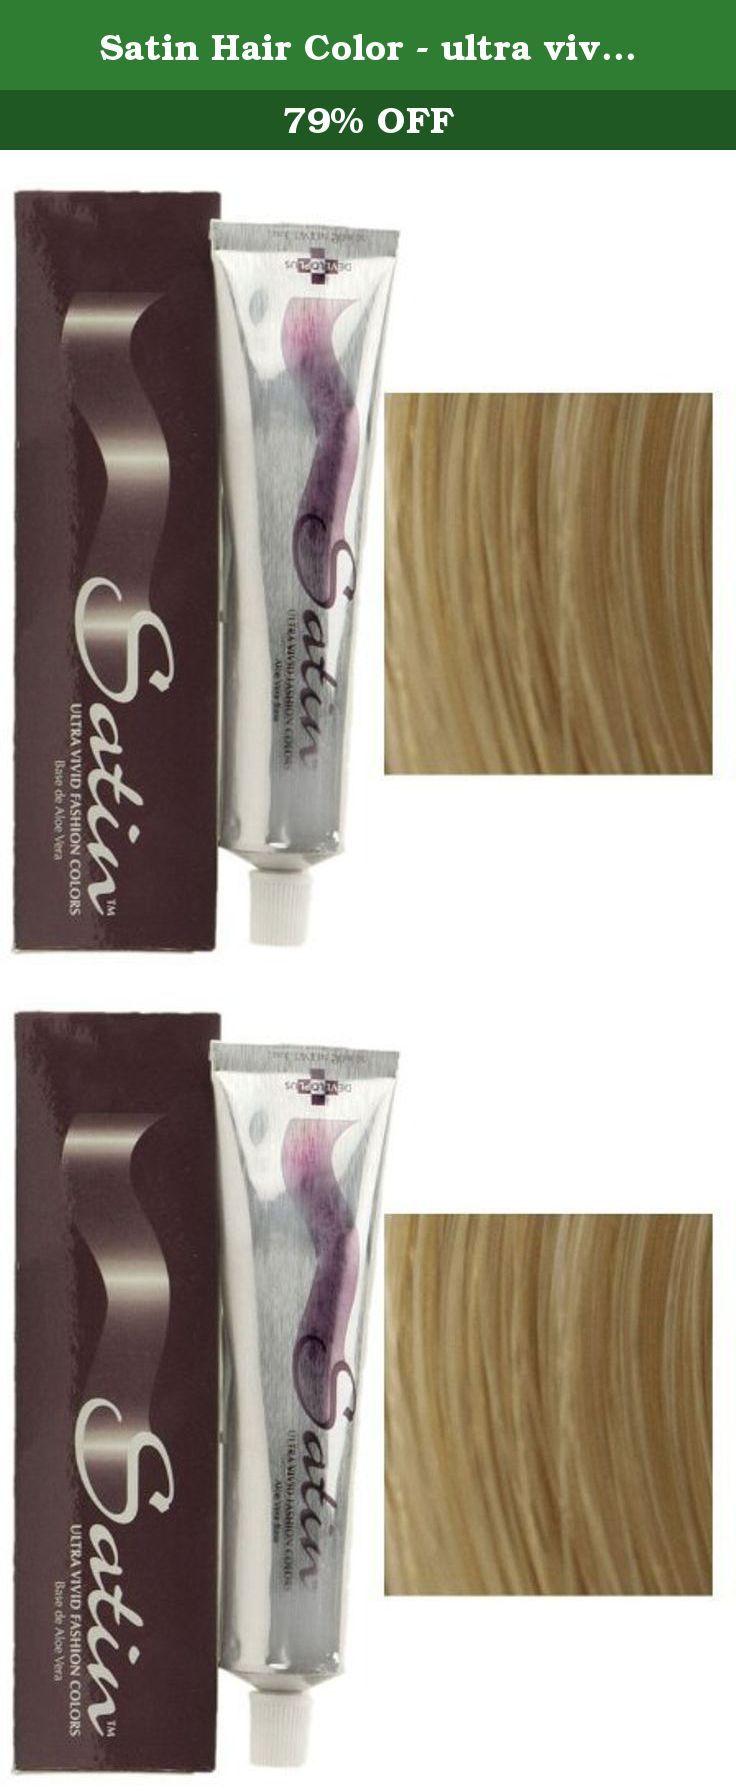 Satin Hair Color Ultra Vivid Fashion Colors 8G Developlus